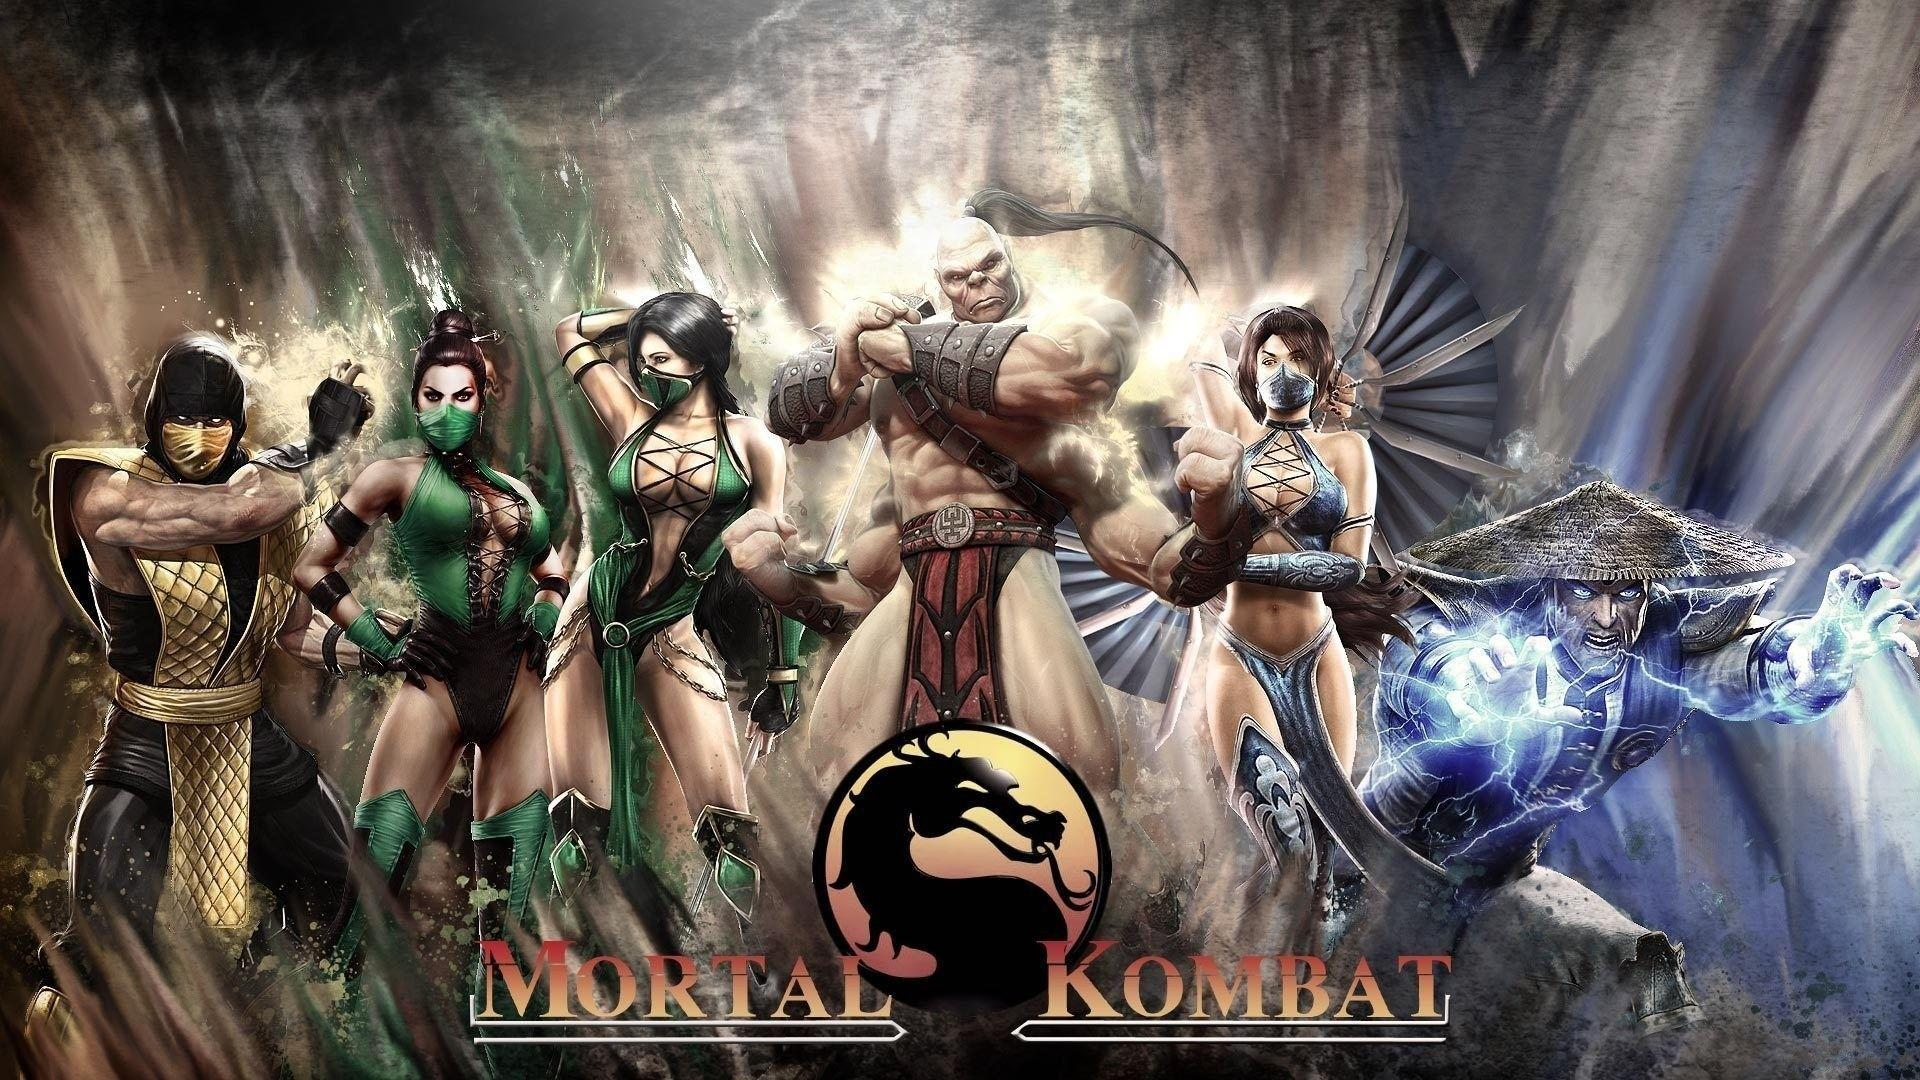 Mortal Kombat 9 Characters Wallpapers - Wallpaper Cave